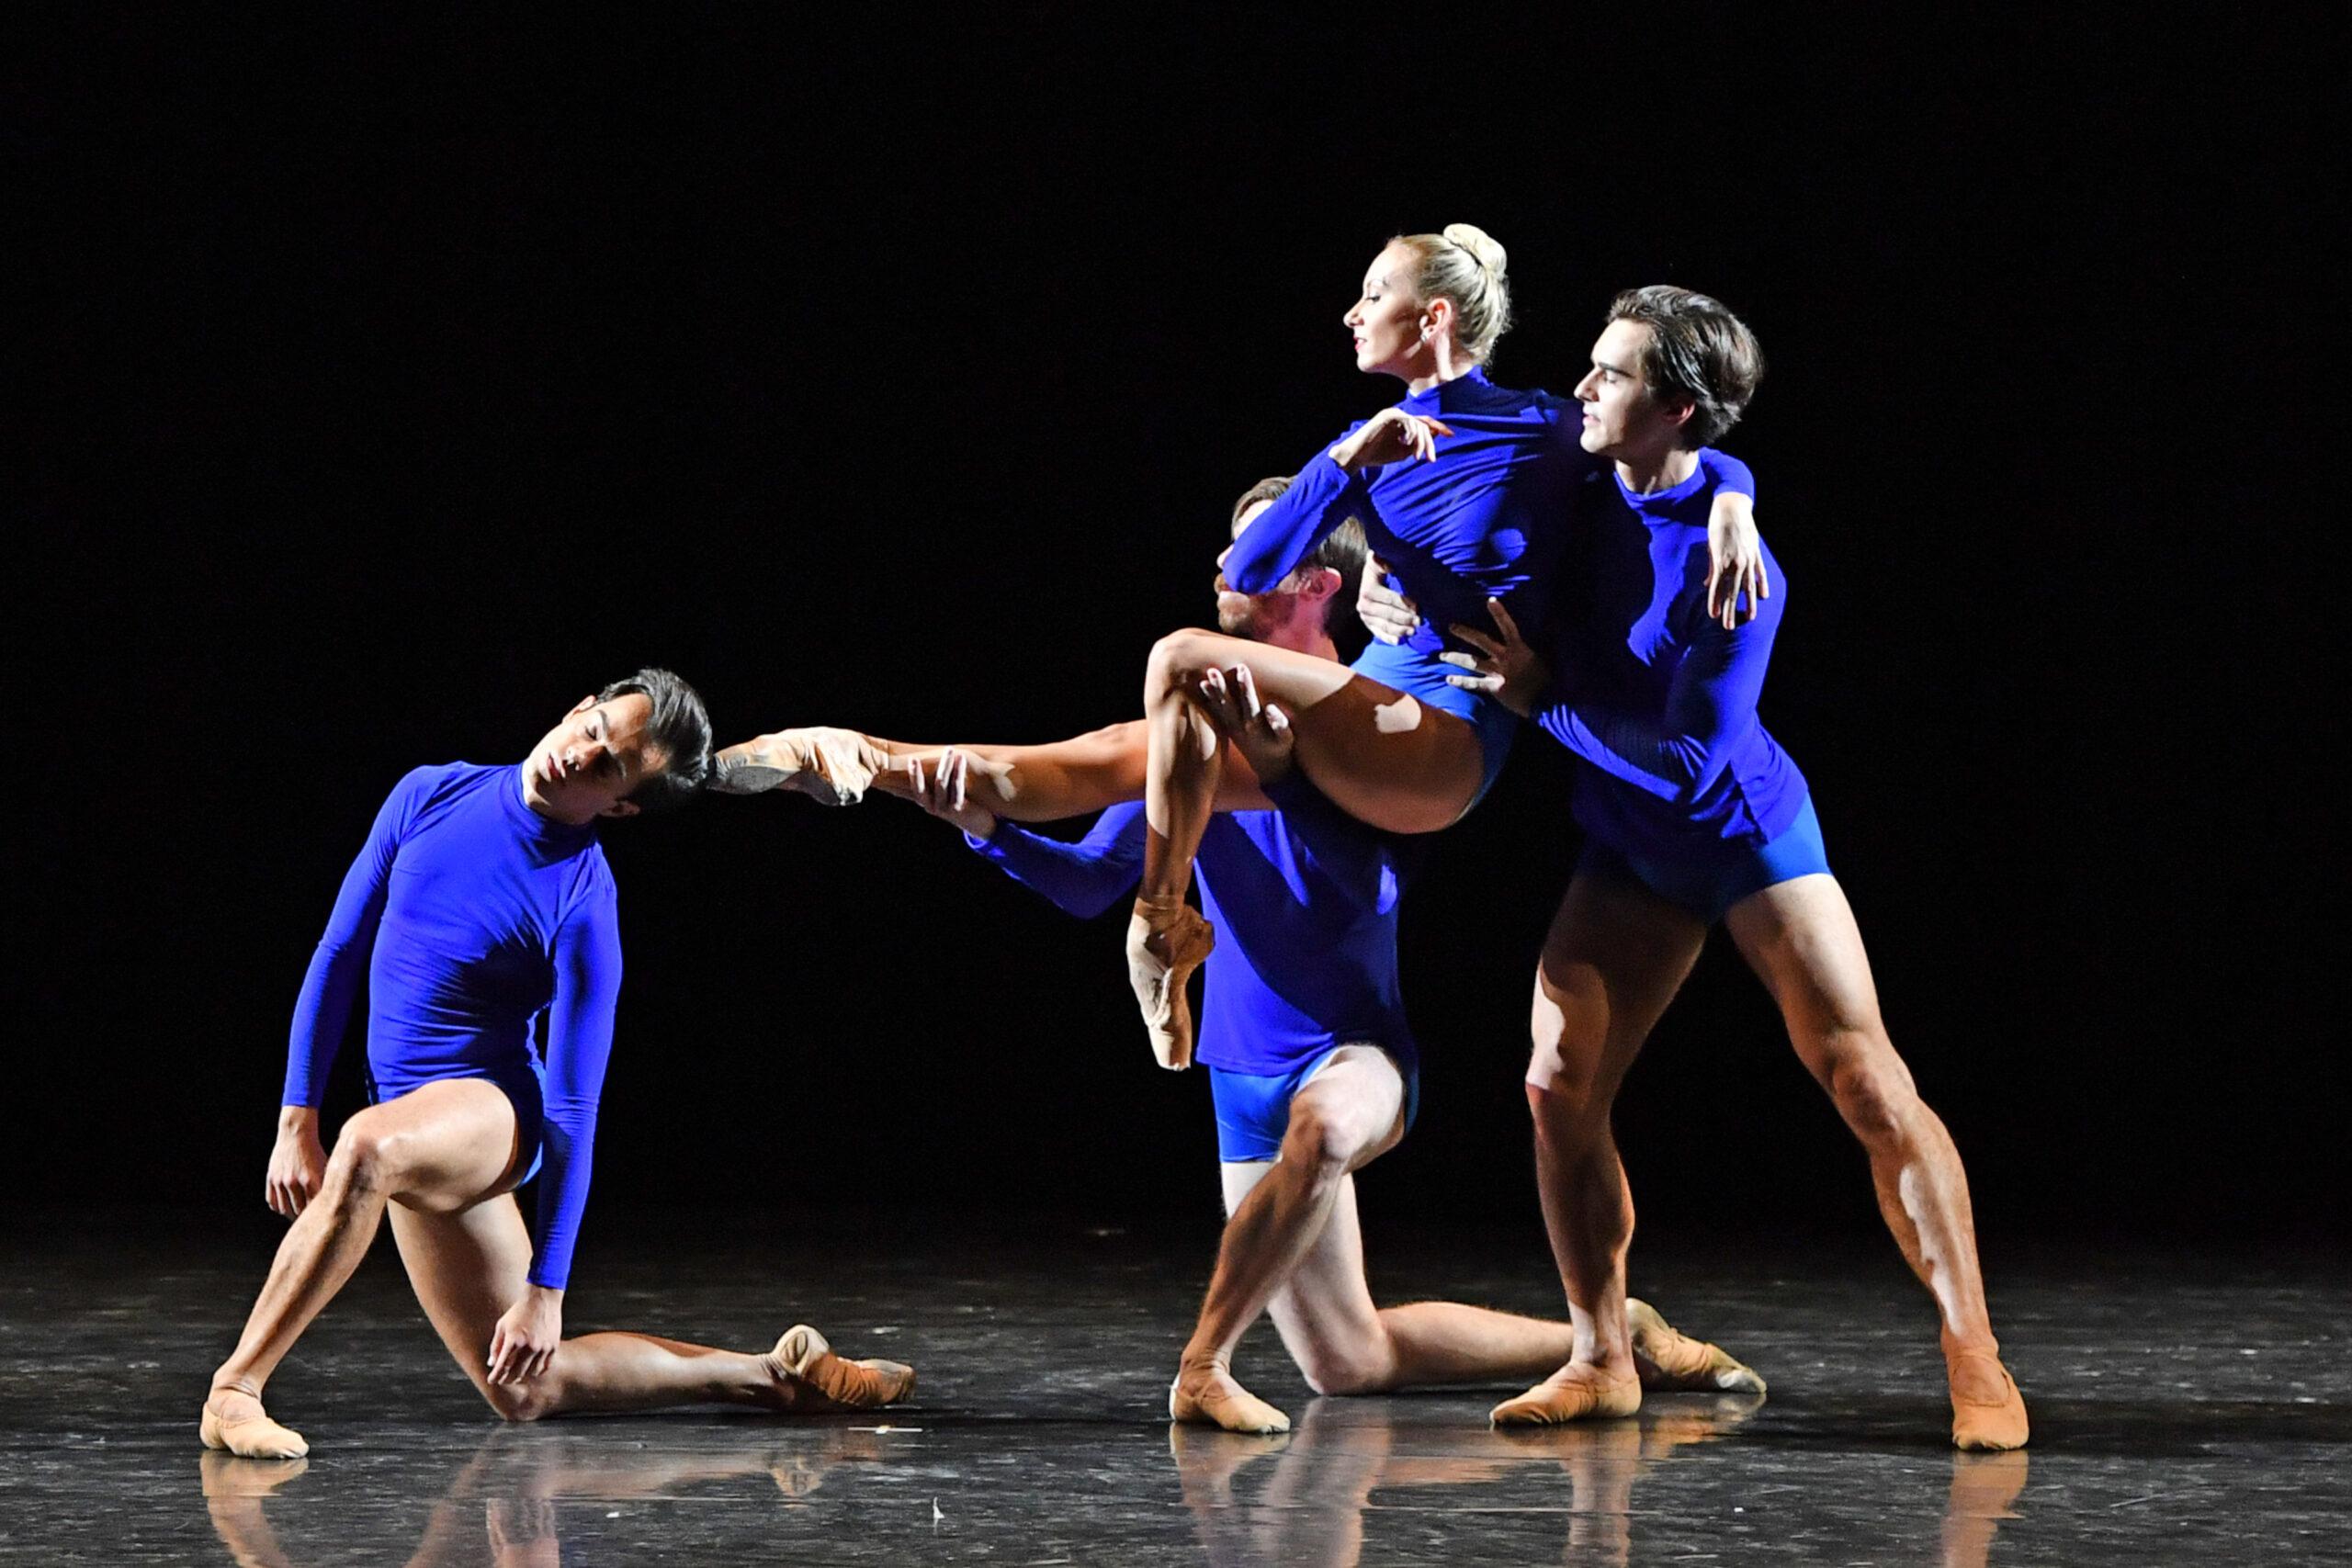 Rhapsody in Blue group of 4 dancers